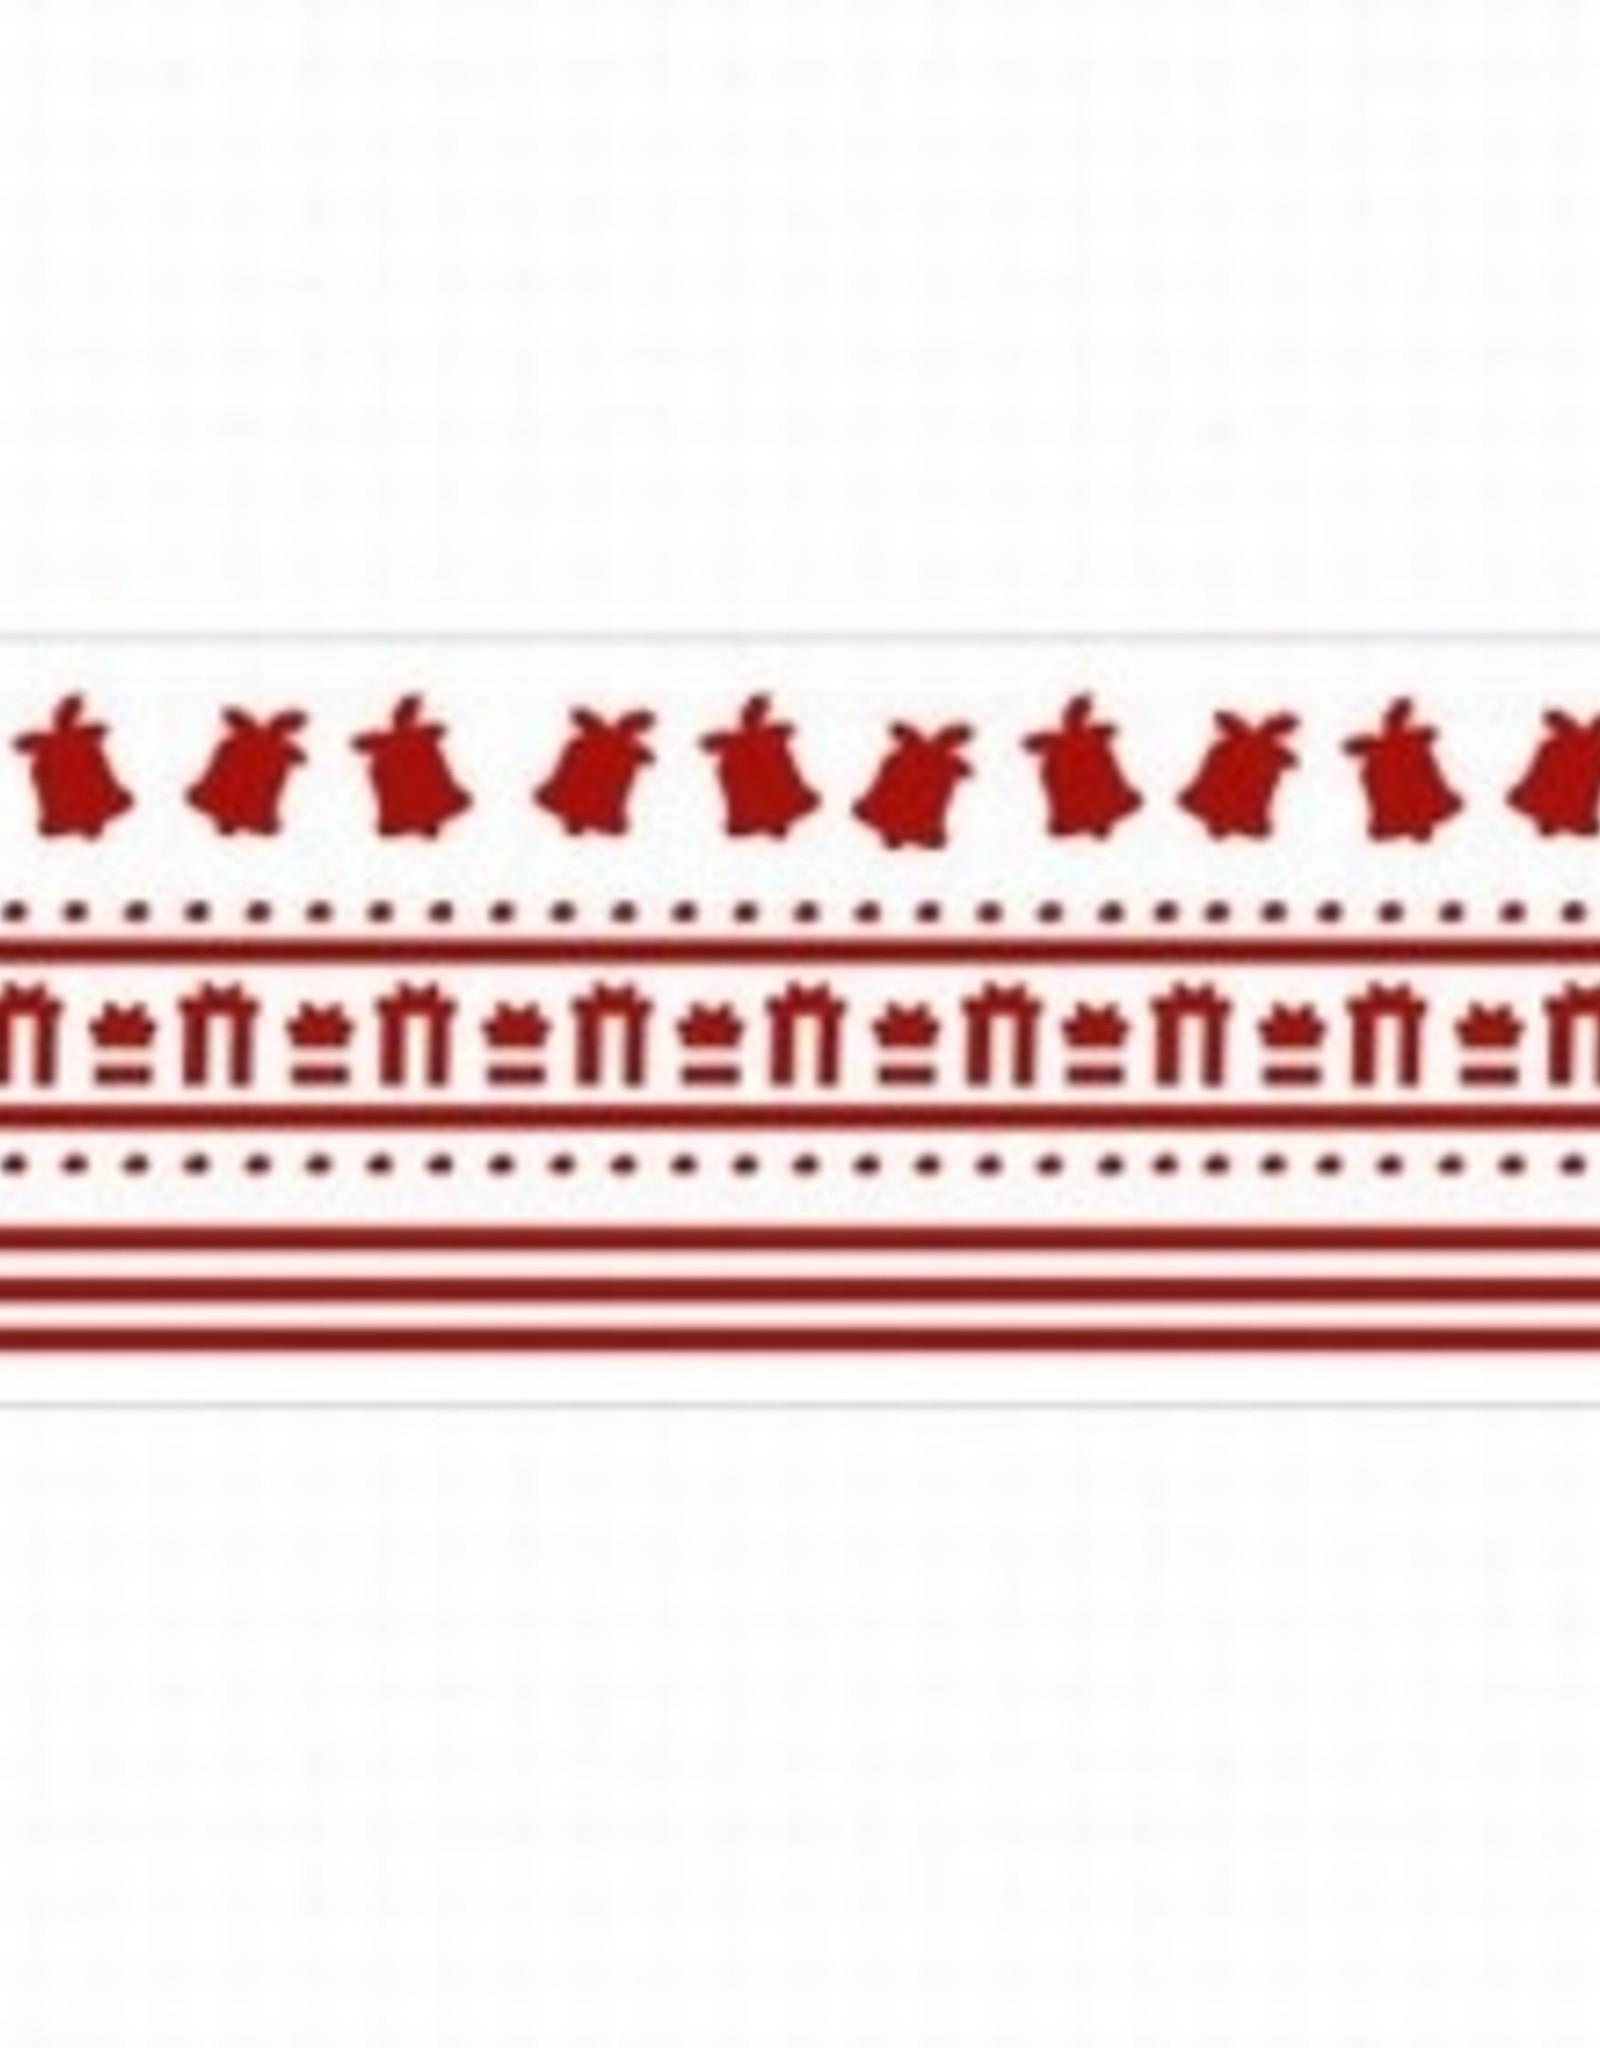 Decora Decora Stencil 7x30cm Christmas Gifts